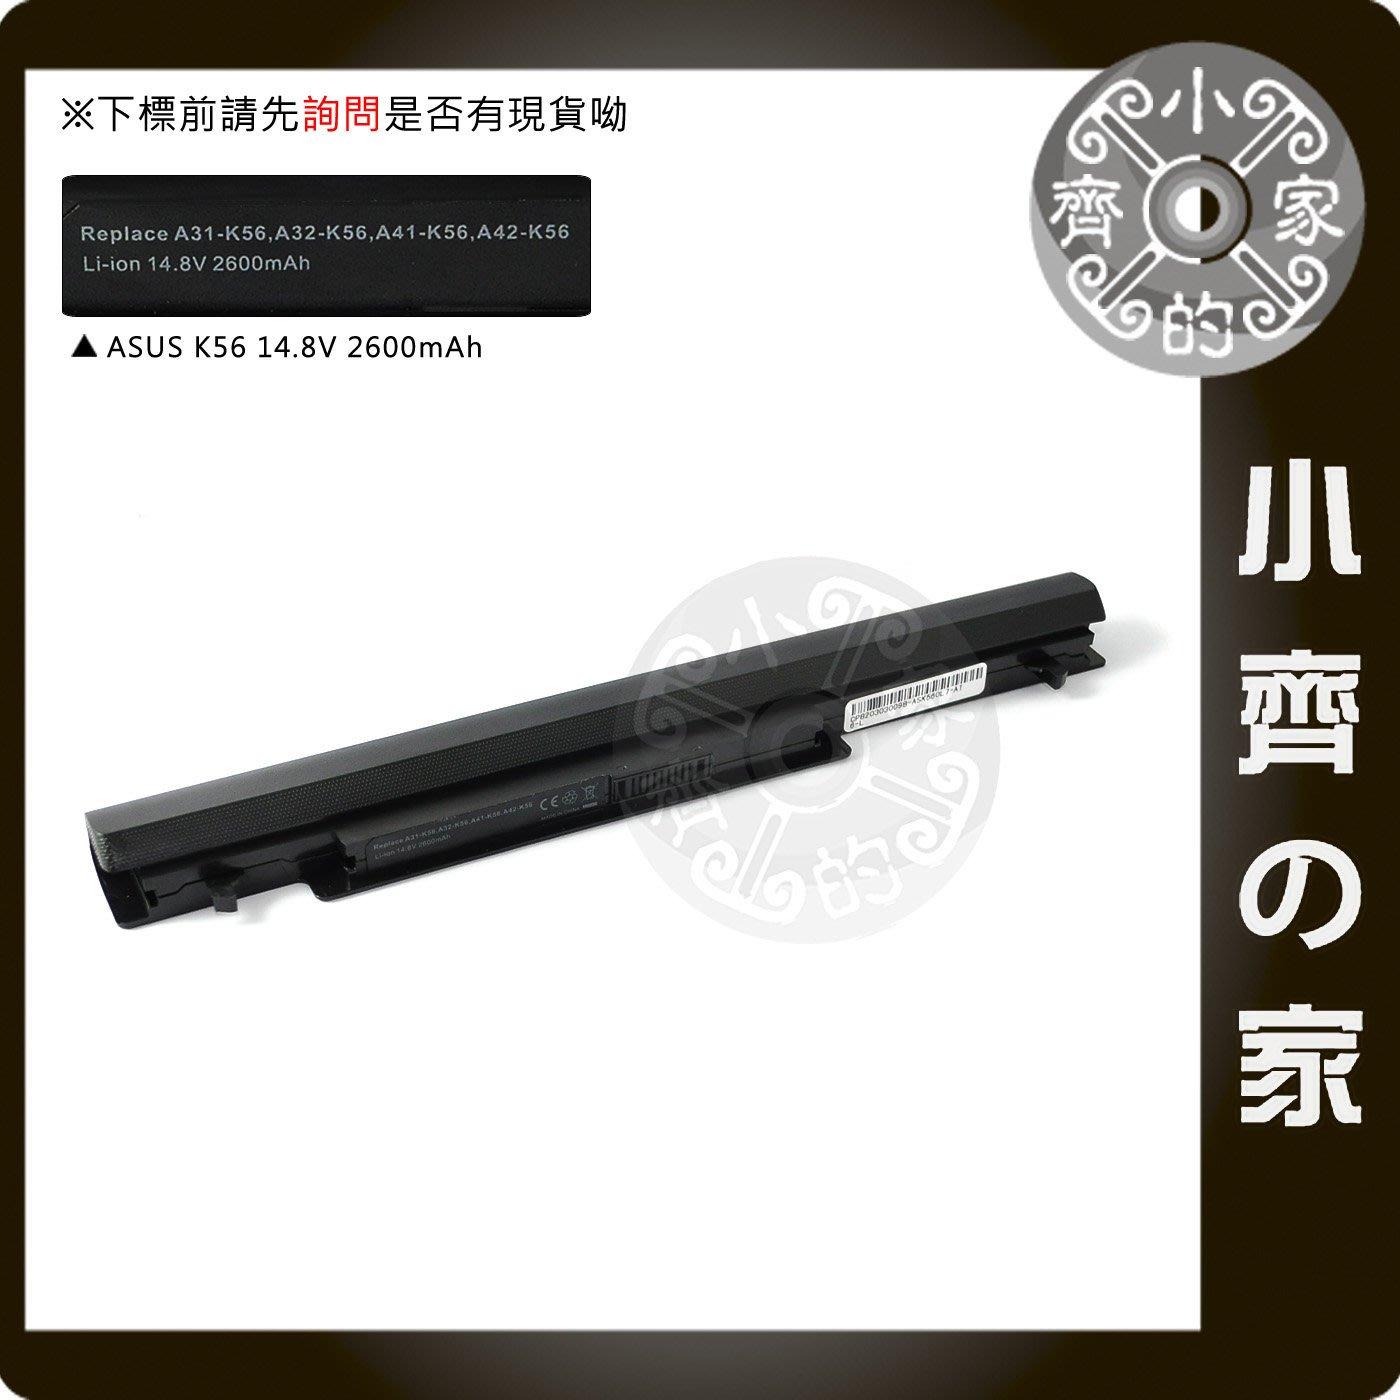 Baterai Asus Ultrabook A46 A56 K46 K56 R405 R505 R550 S40 S46 A32 Battery Original A46c A46ca A46cm K46c K46ca K46cm K56c K56ca K56cm A31 A41